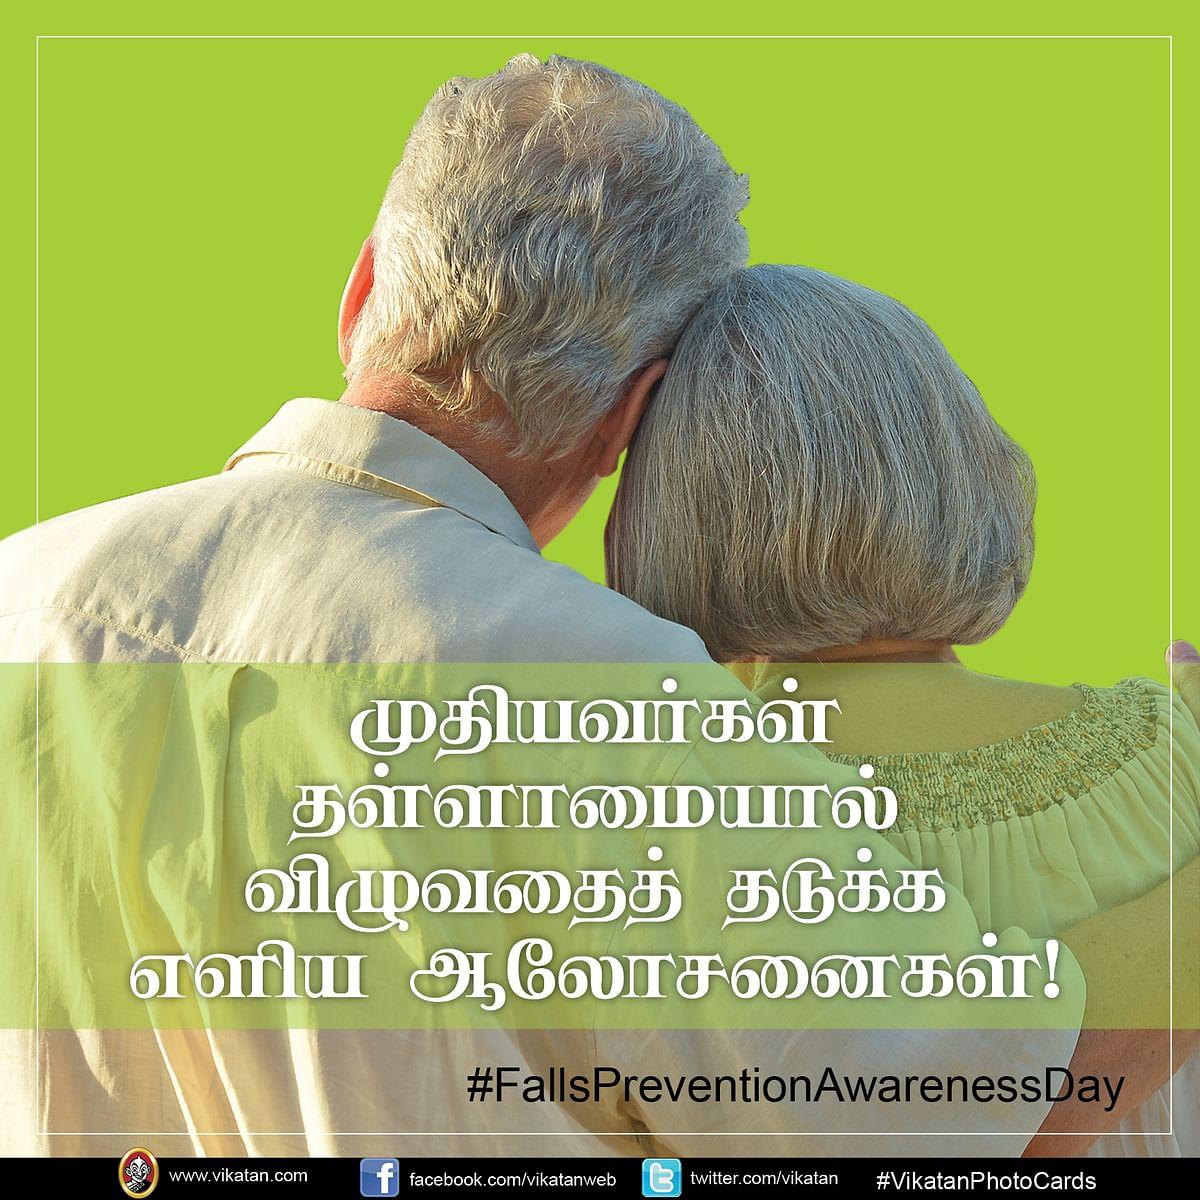 #FallsPreventionAwarenessDay